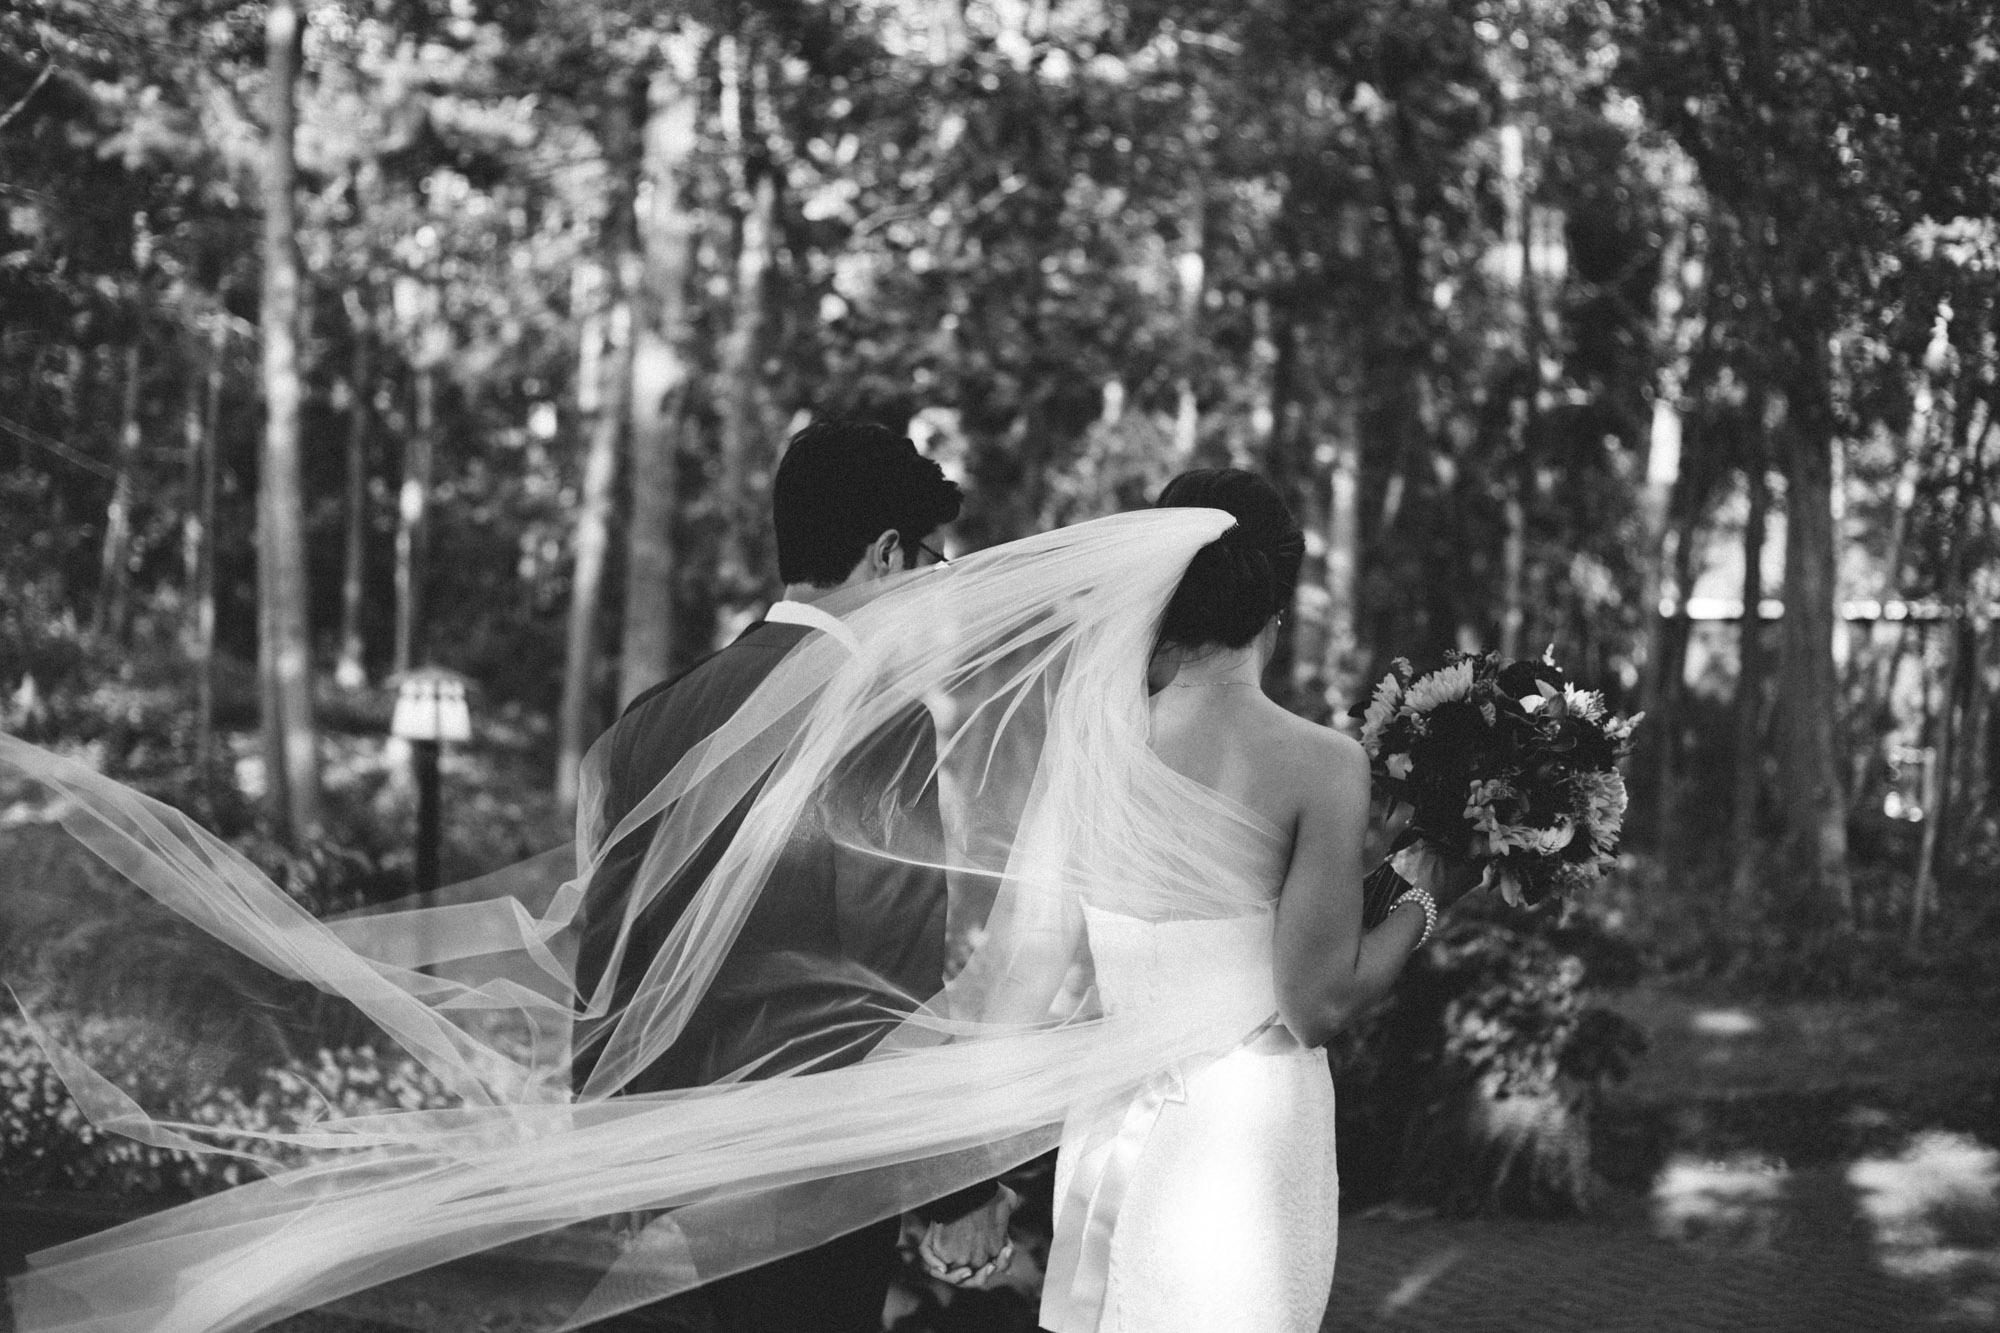 Destination wedding at Grand View Lodge, photography by Britt DeZeeuw